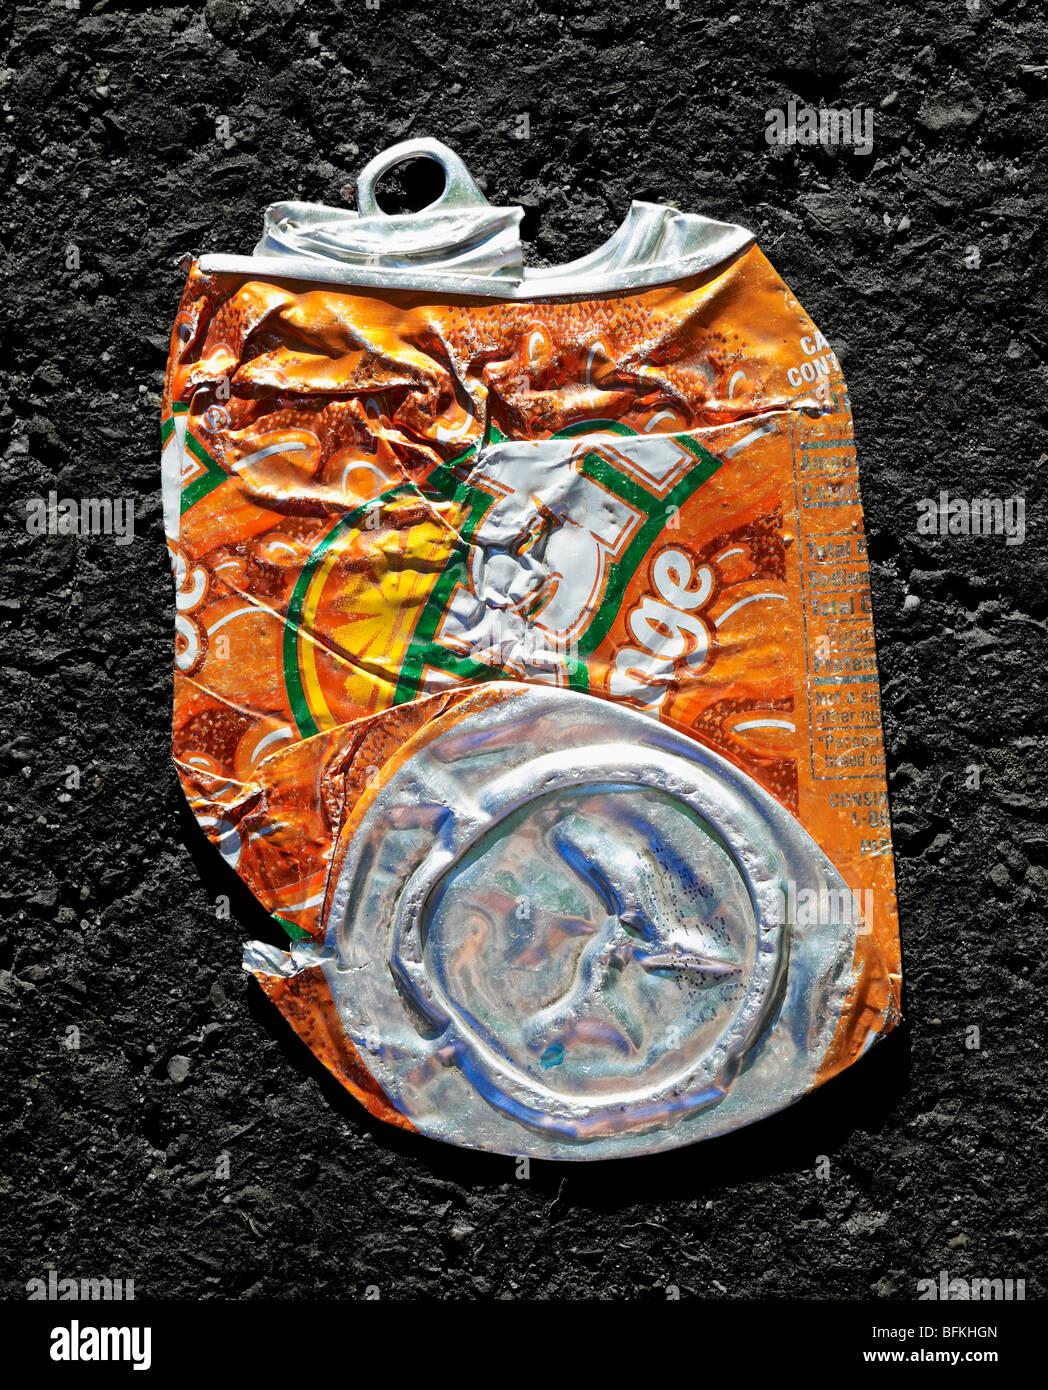 Orange Crush Soda Can Crushed Flat - Stock Image